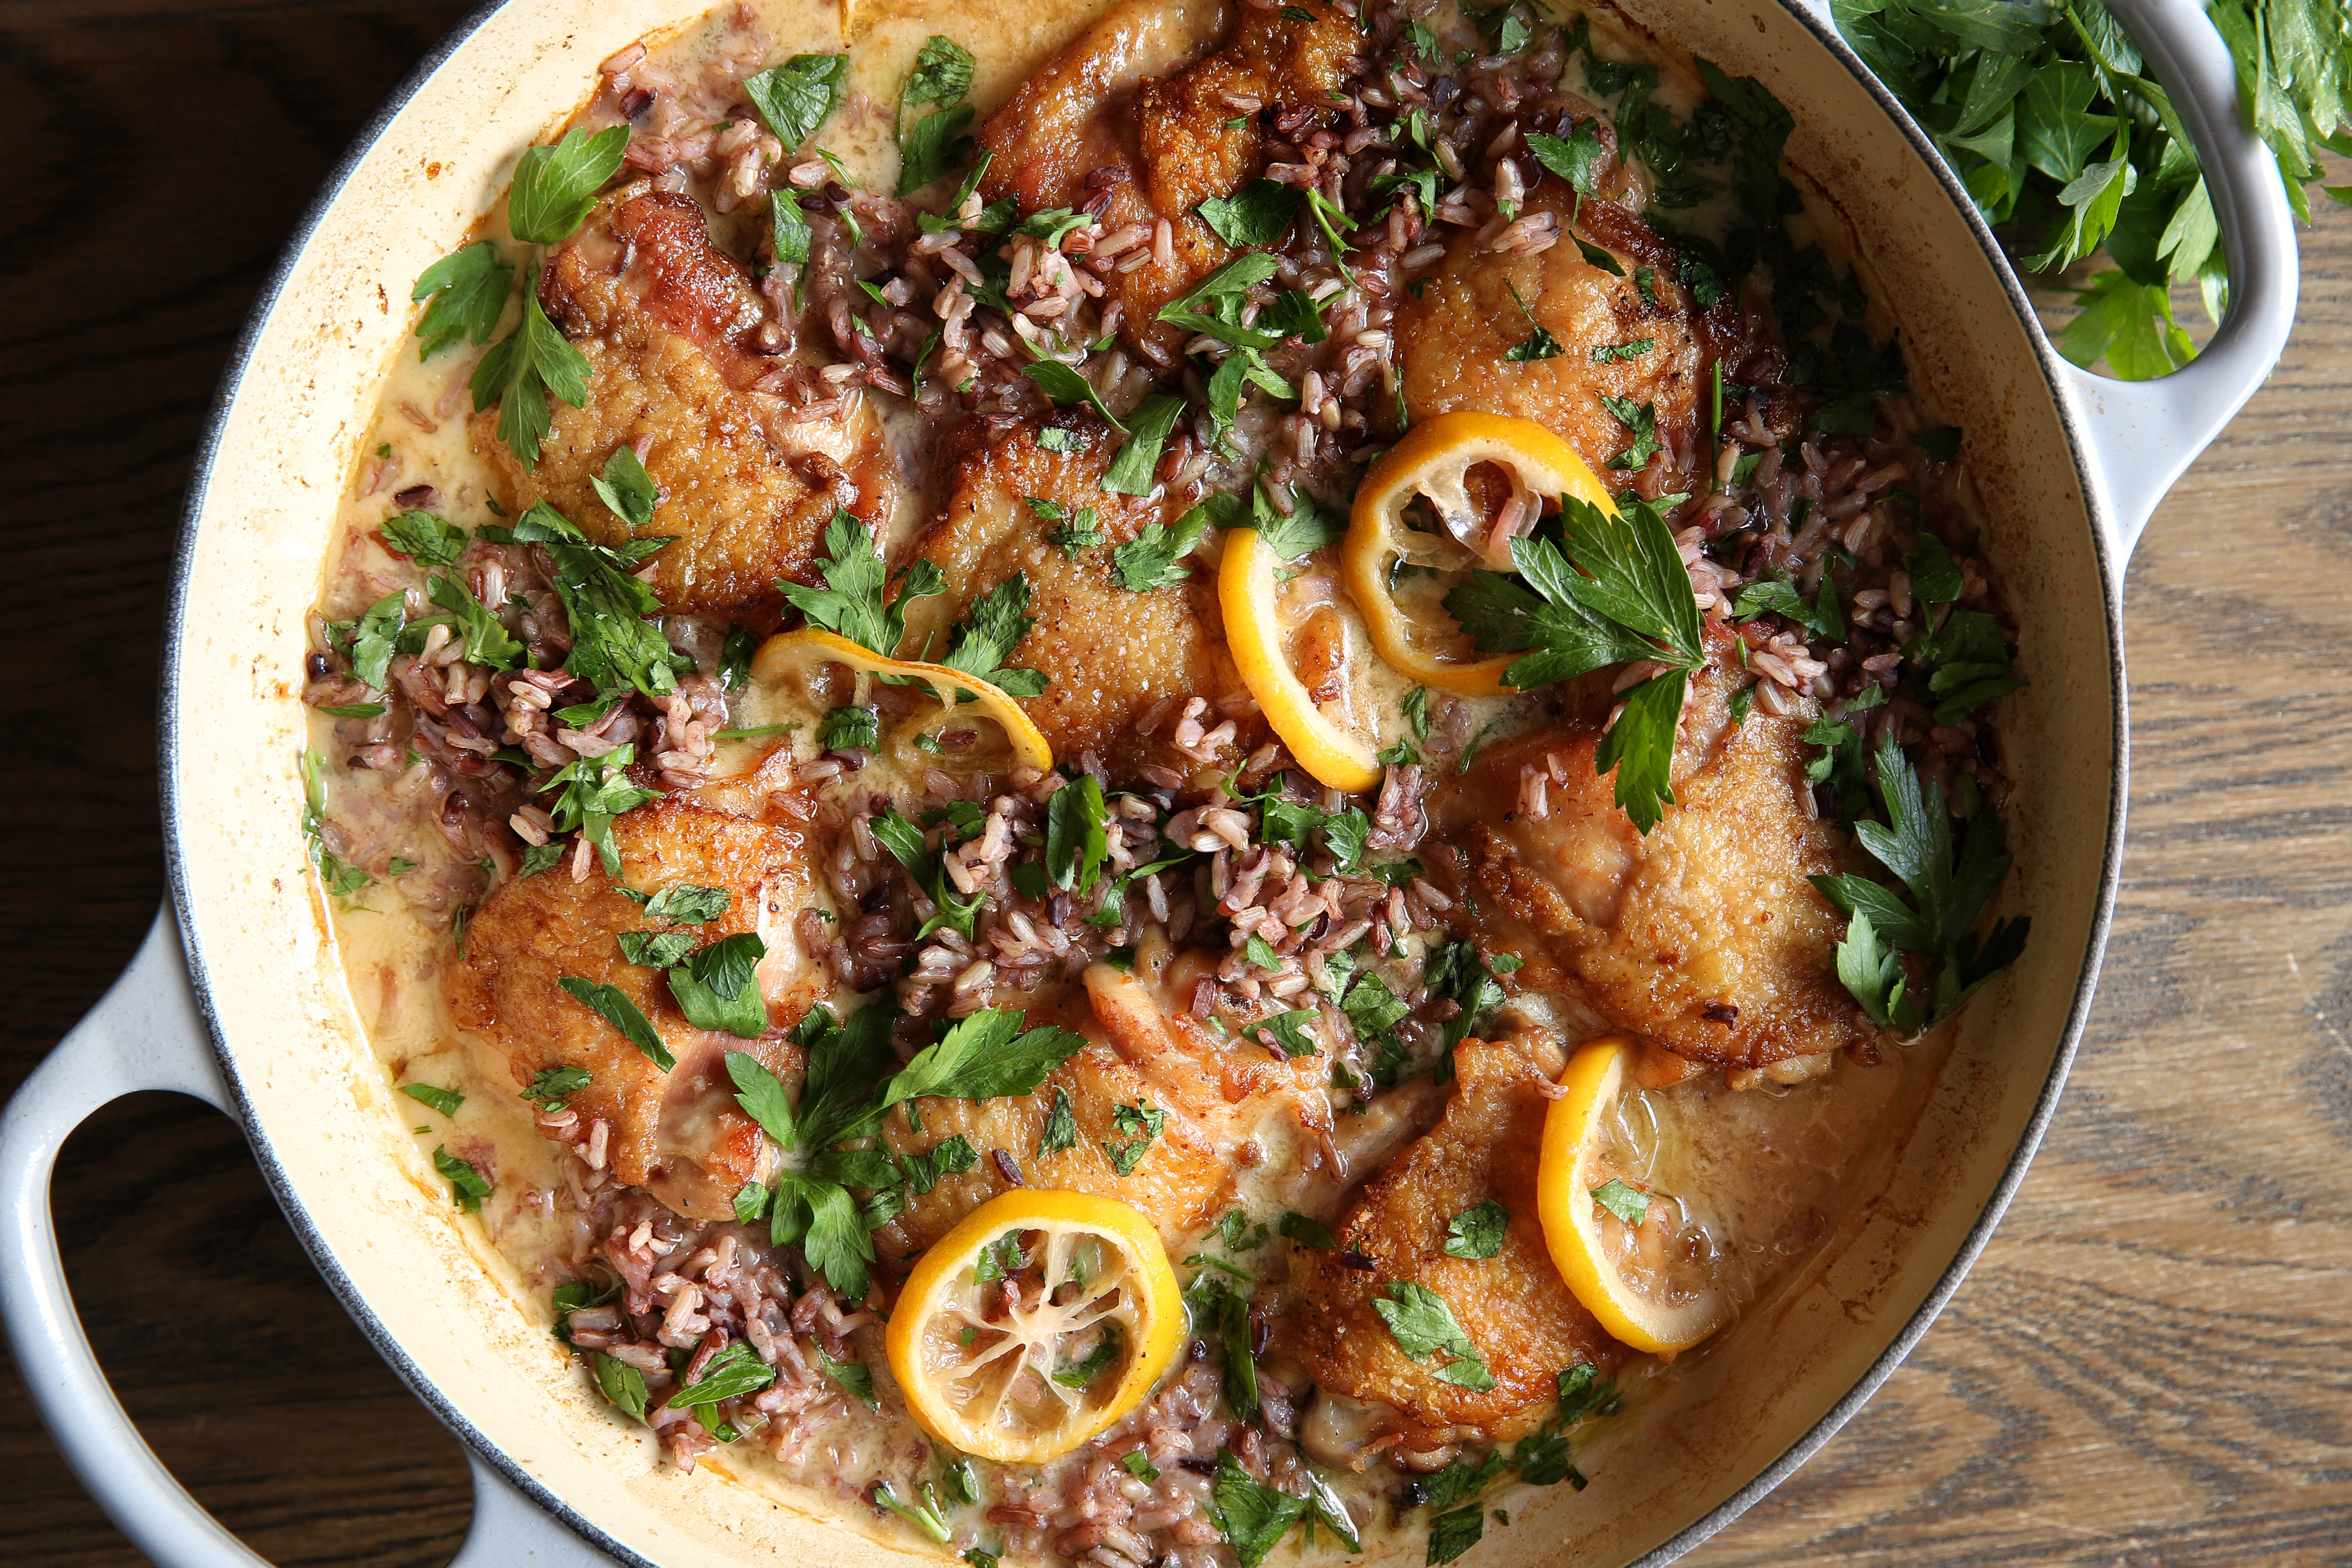 Best Lemon Chicken Recipe How To Make Lemon Chicken